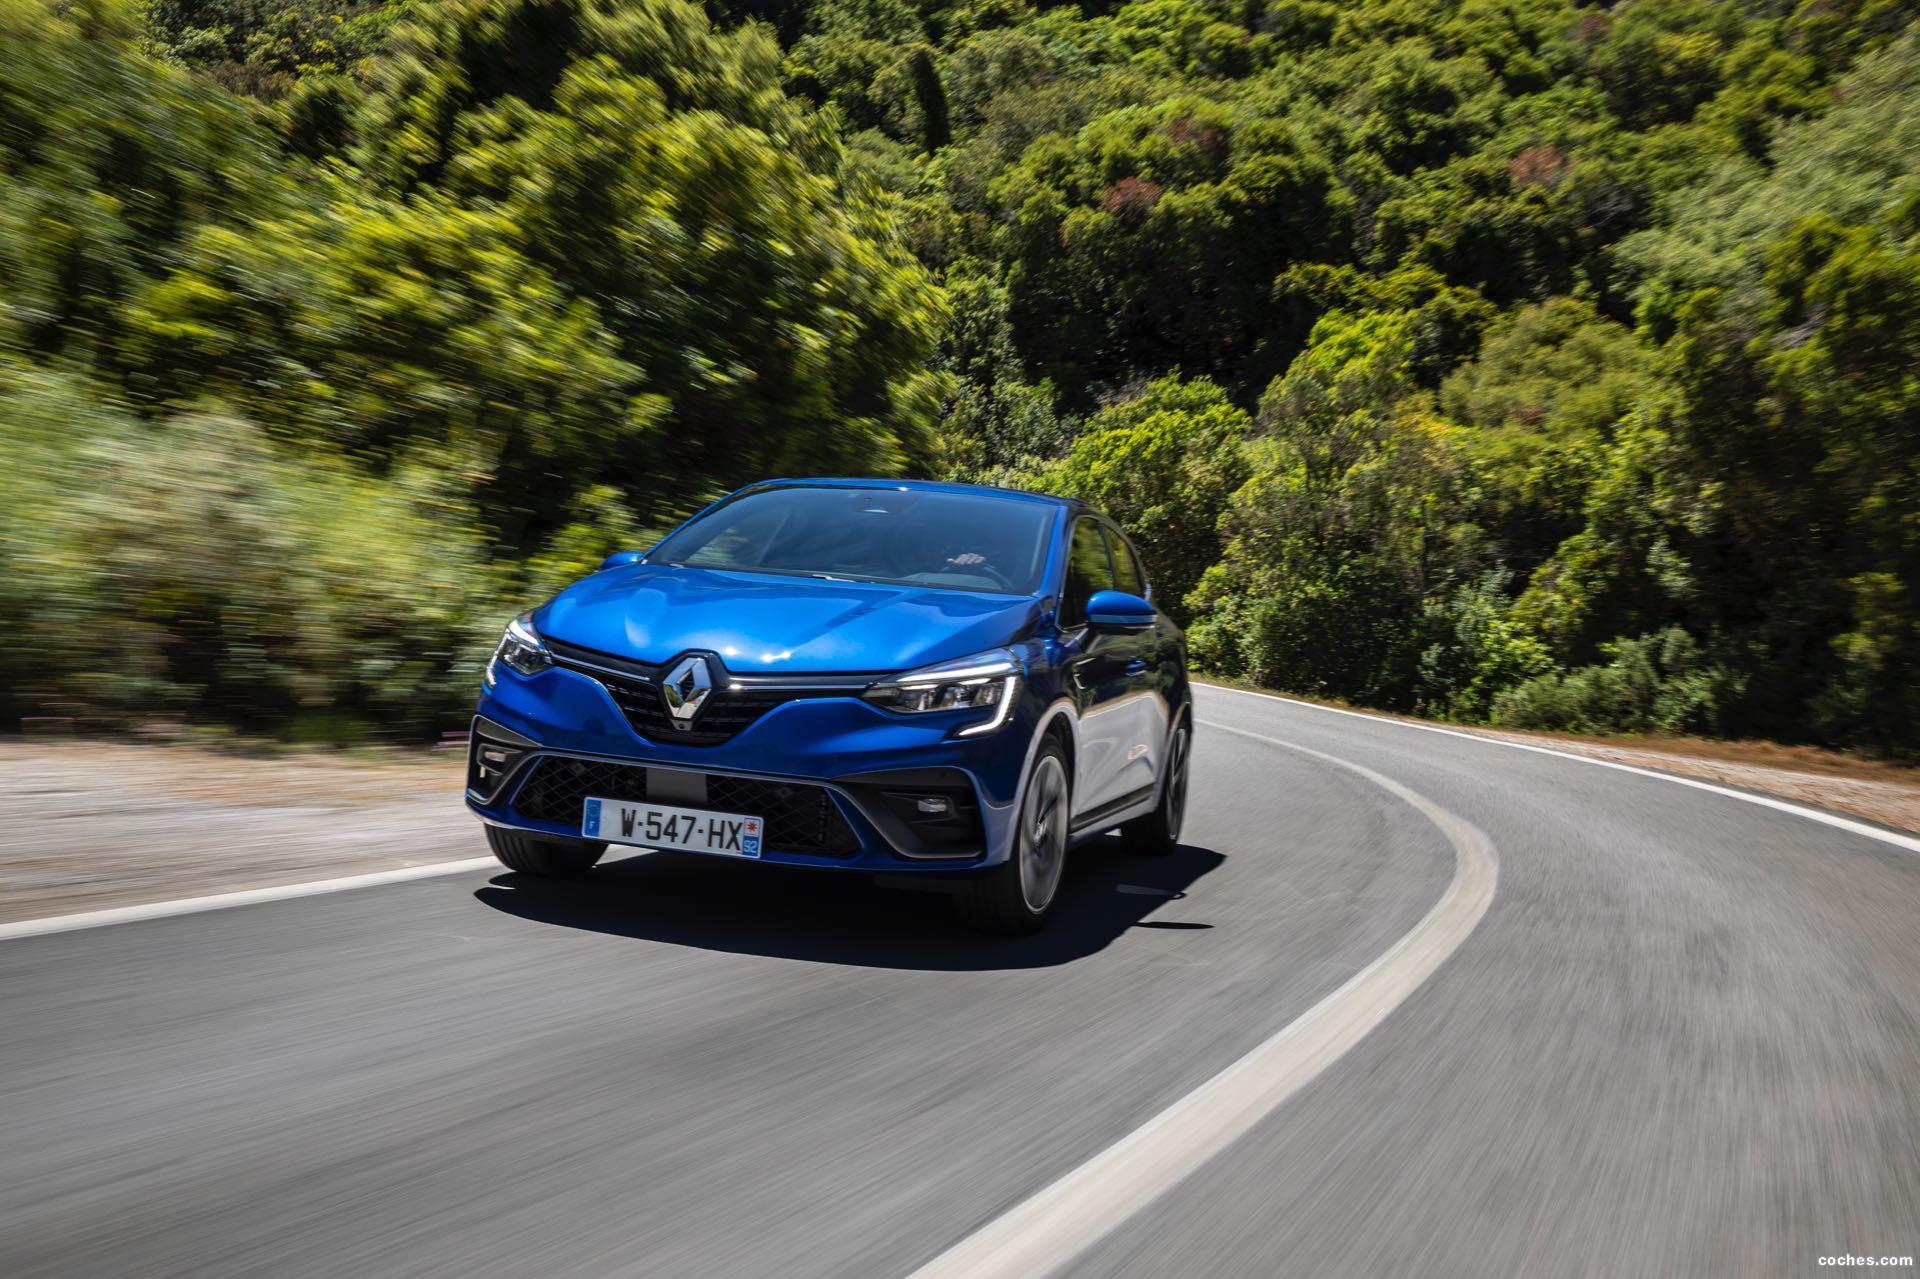 Foto 15 de Renault Clio R.S. Line 2019